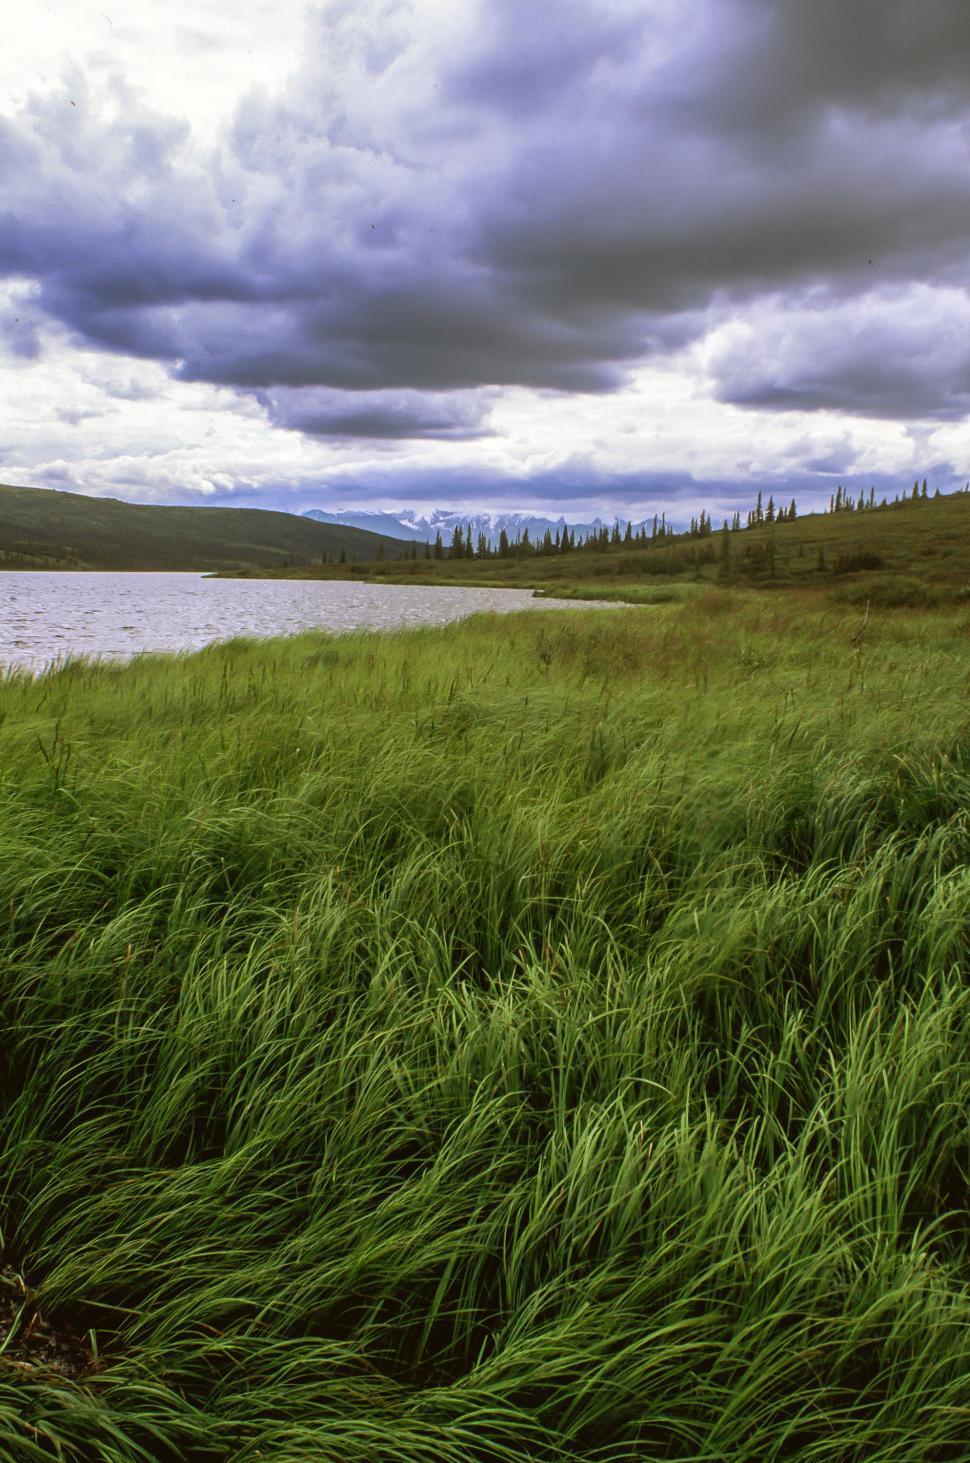 Download Free Stock Photo of Marsh grass